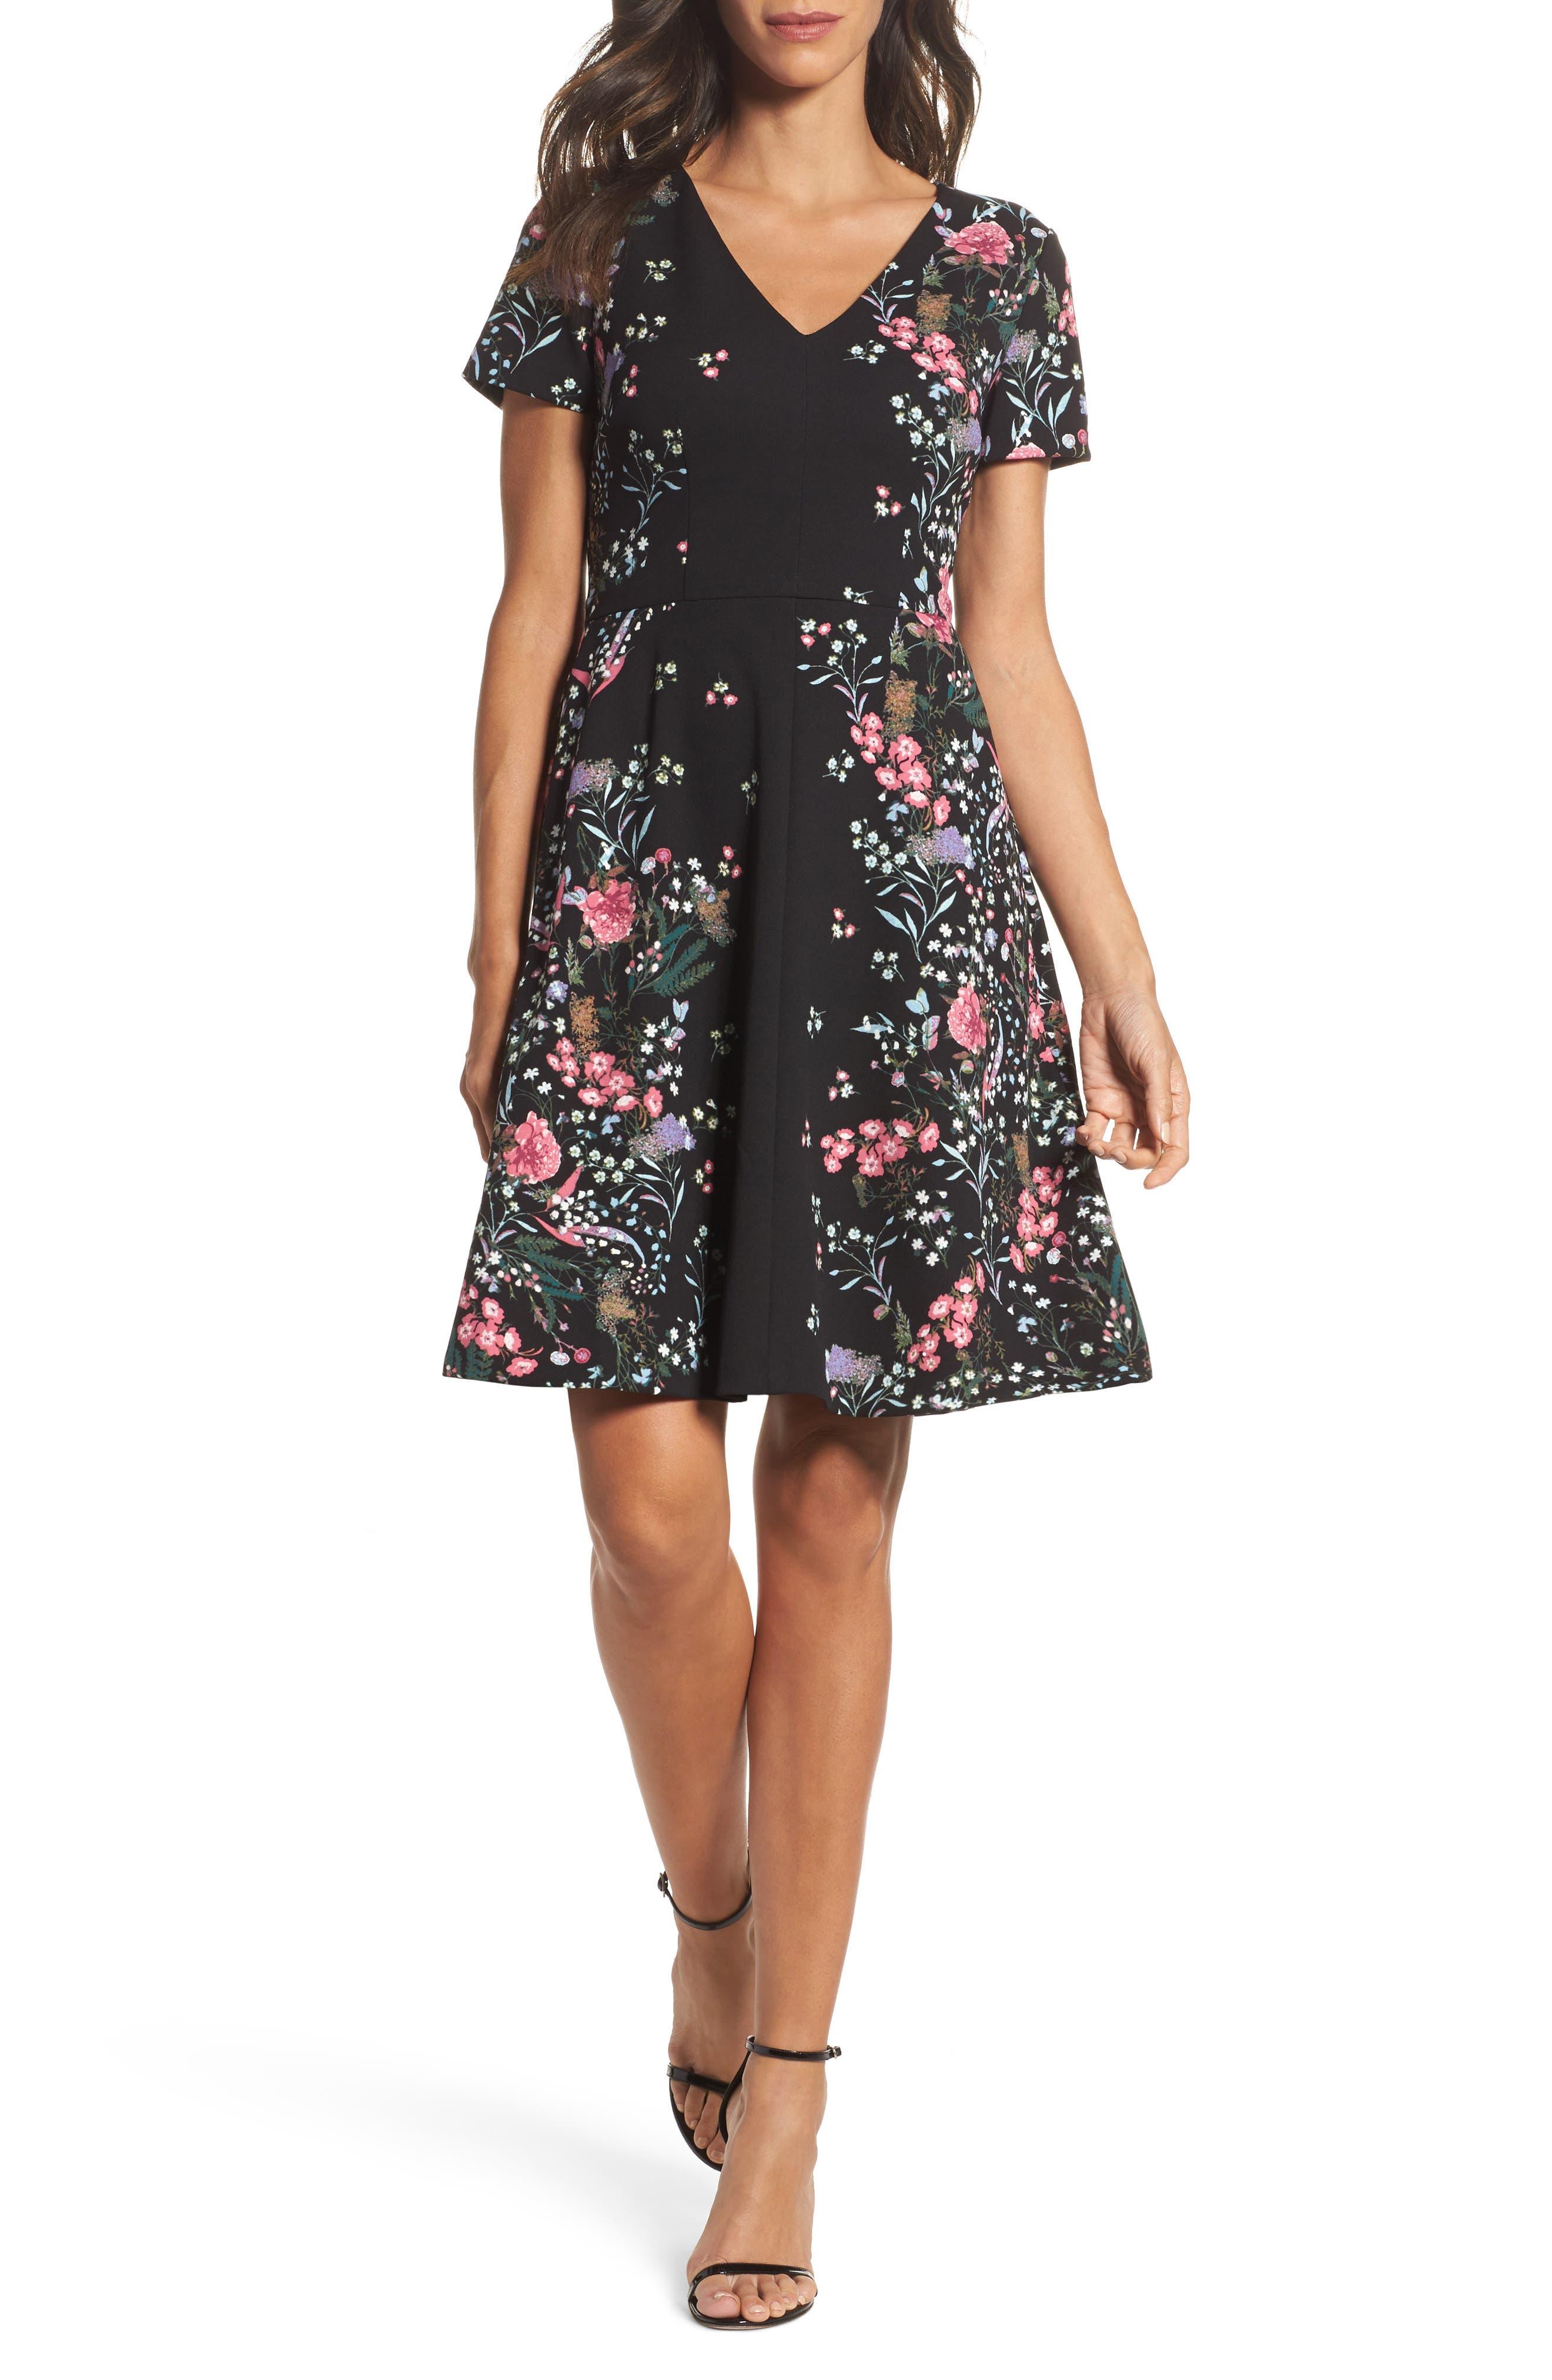 Alternate Image 1 Selected - Adrianna Papell Print Scuba Knit Fit & Flare Dress (Regular & Petite)